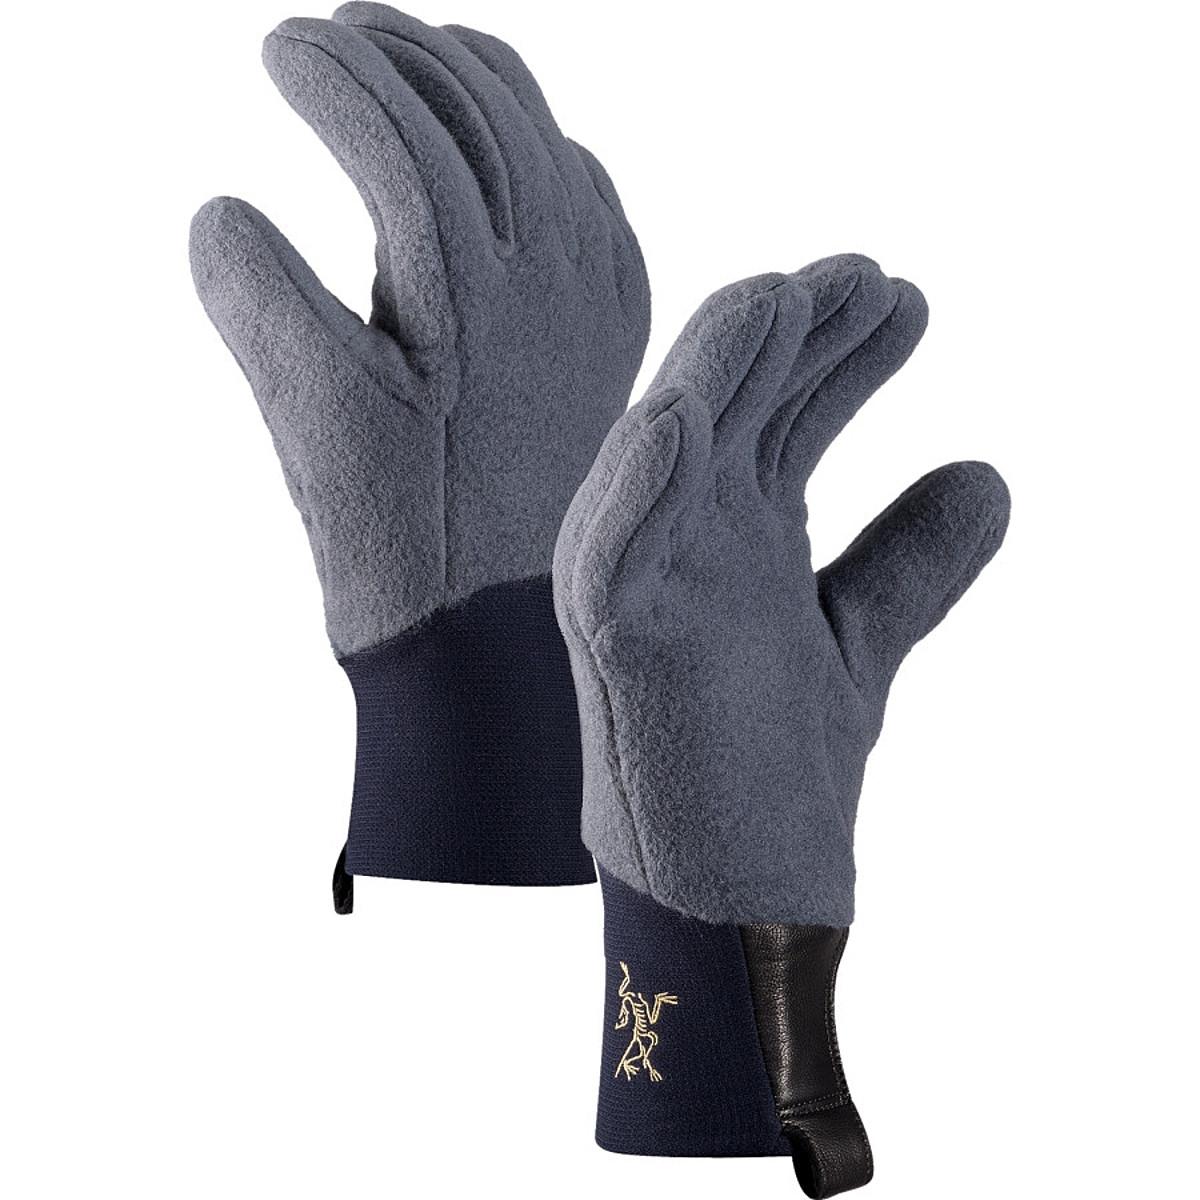 Arc'teryx Delta AR Glove